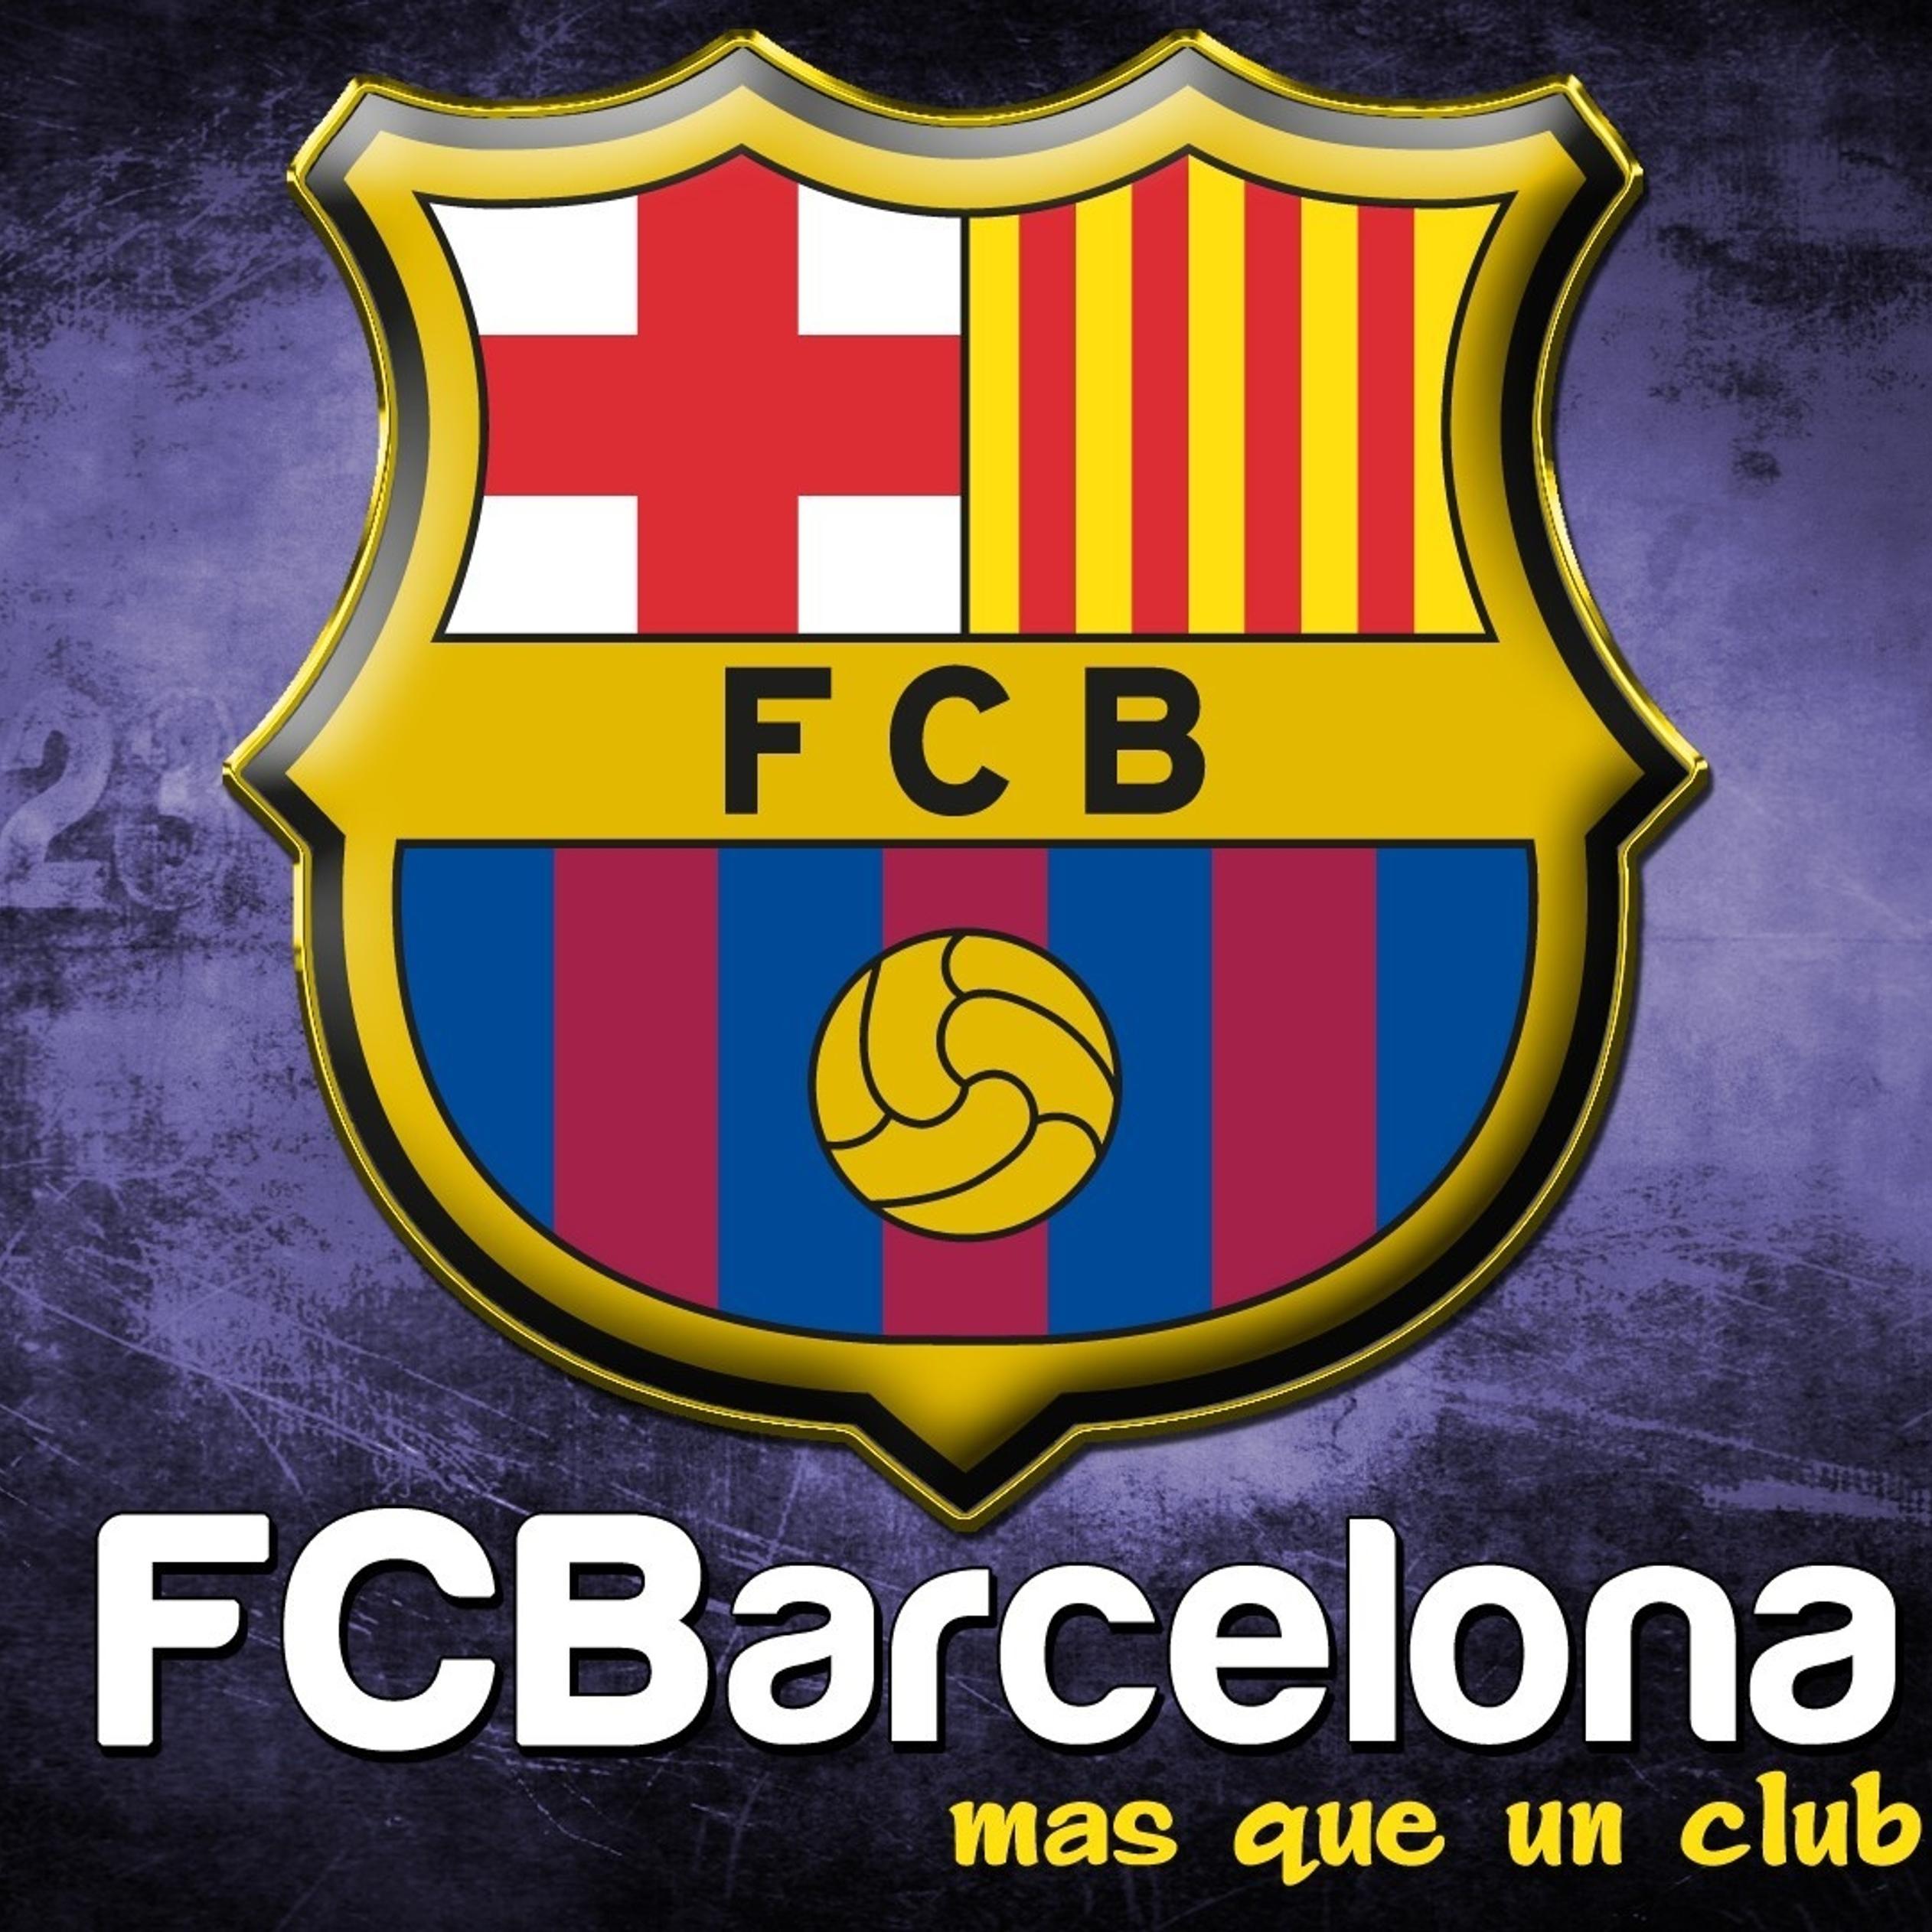 Logo of FC Barcelona football club